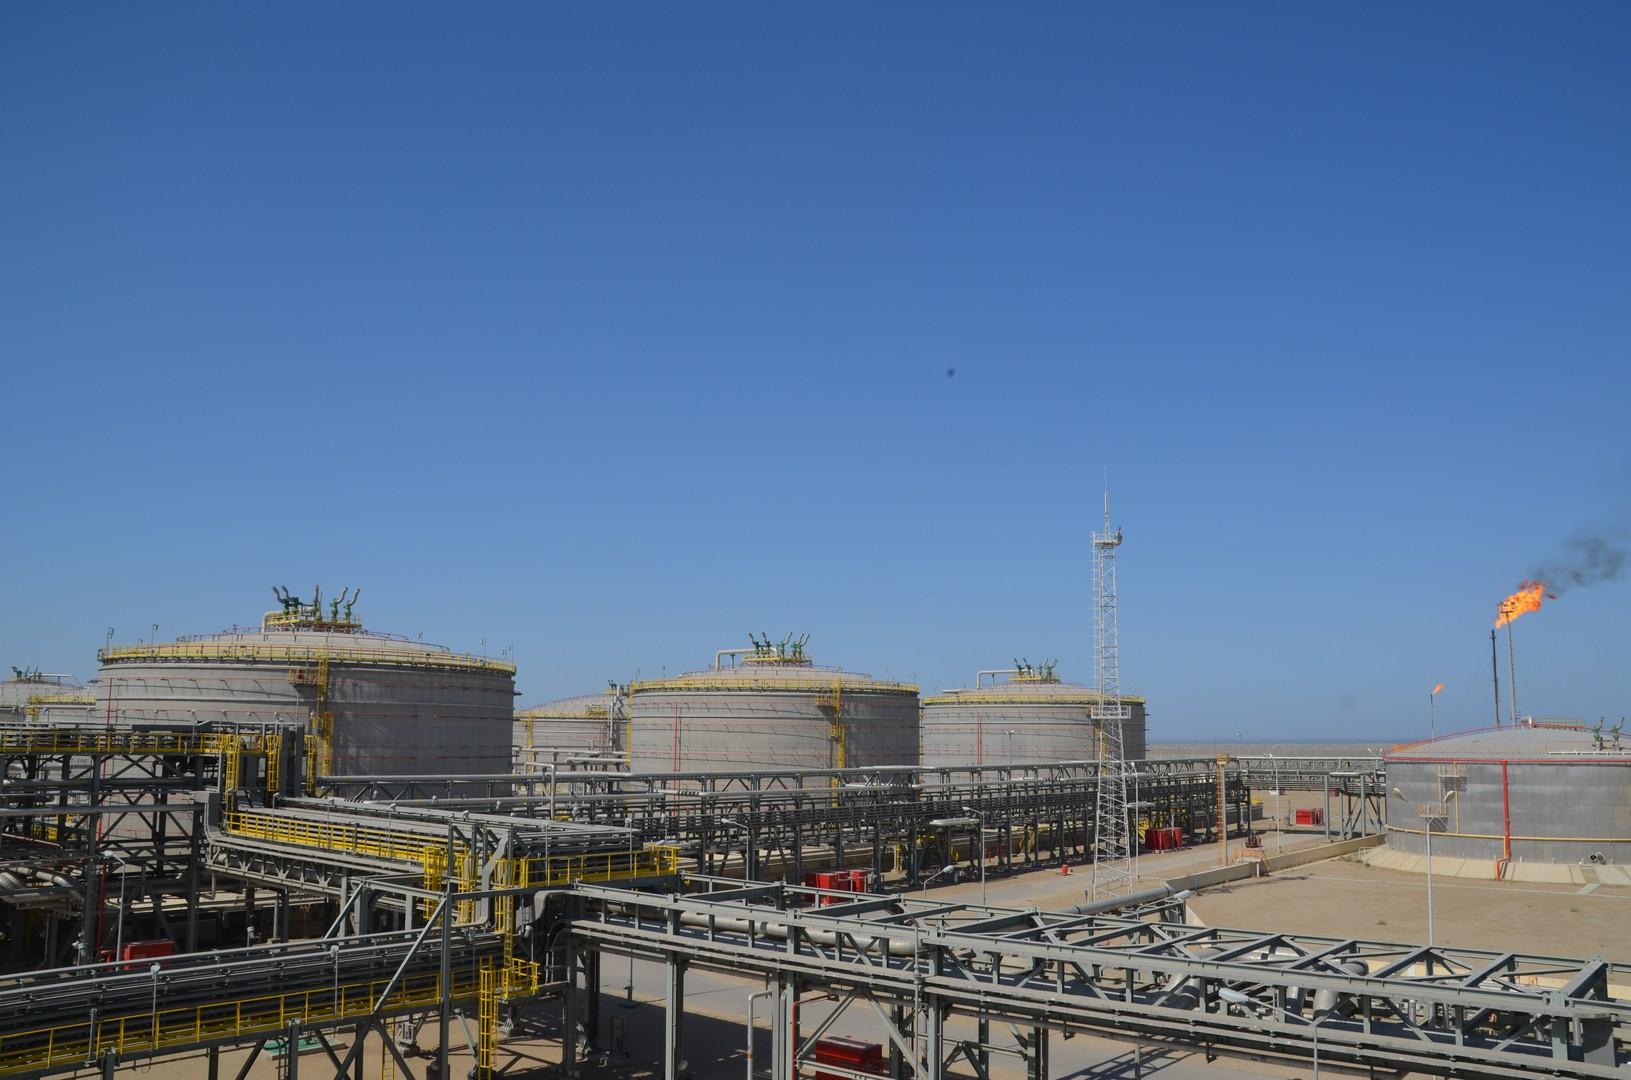 Crude Oil Tank Farm Terminal Project